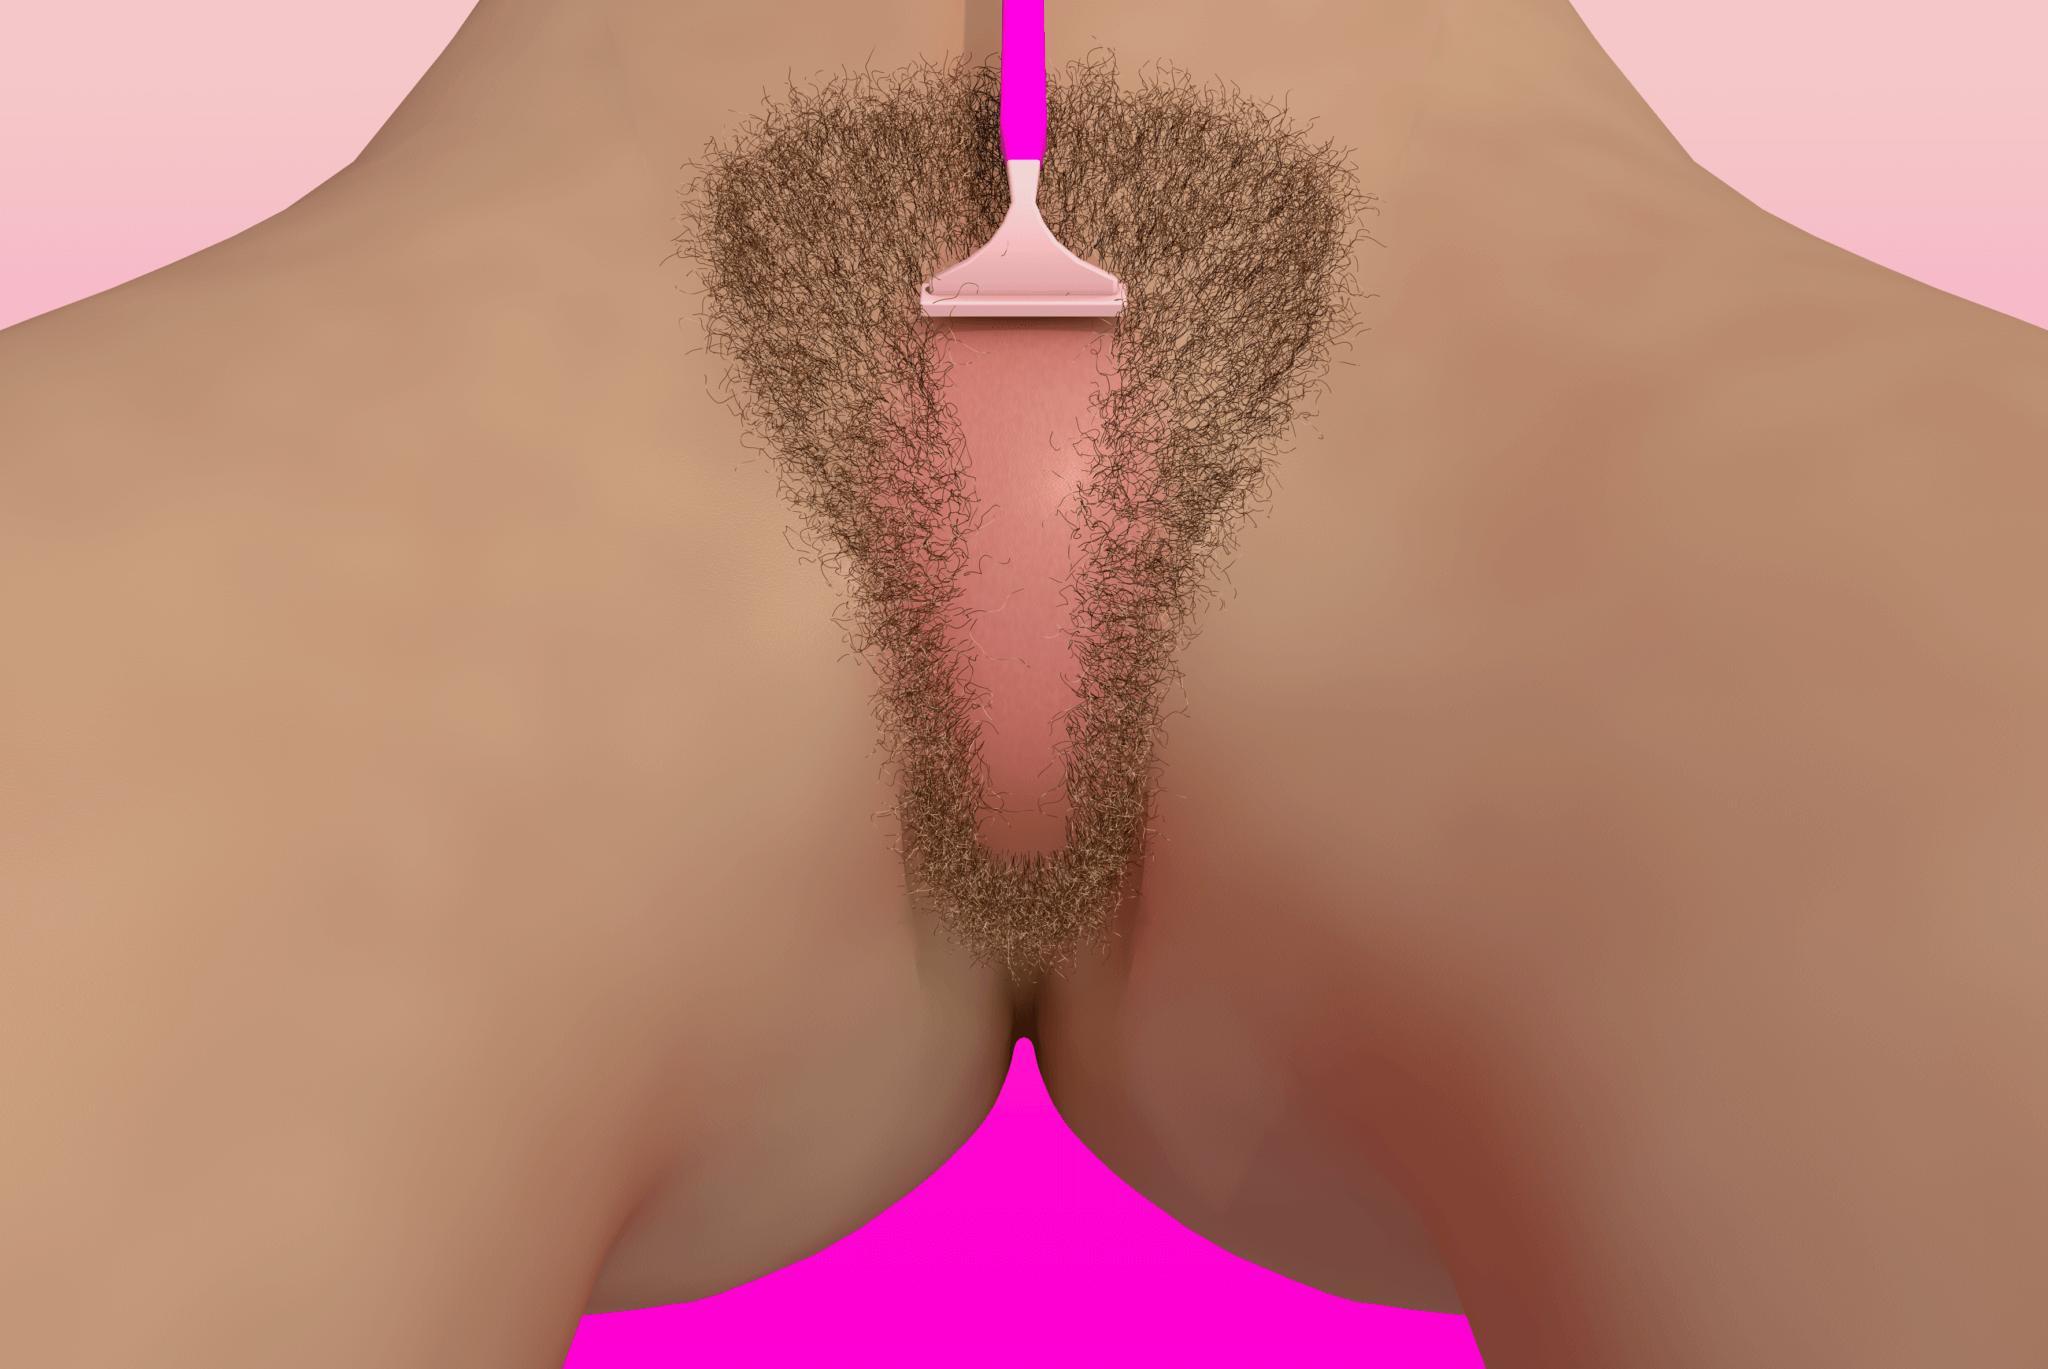 Shaved. Ilustración: Can Sezer/Girls Unawares